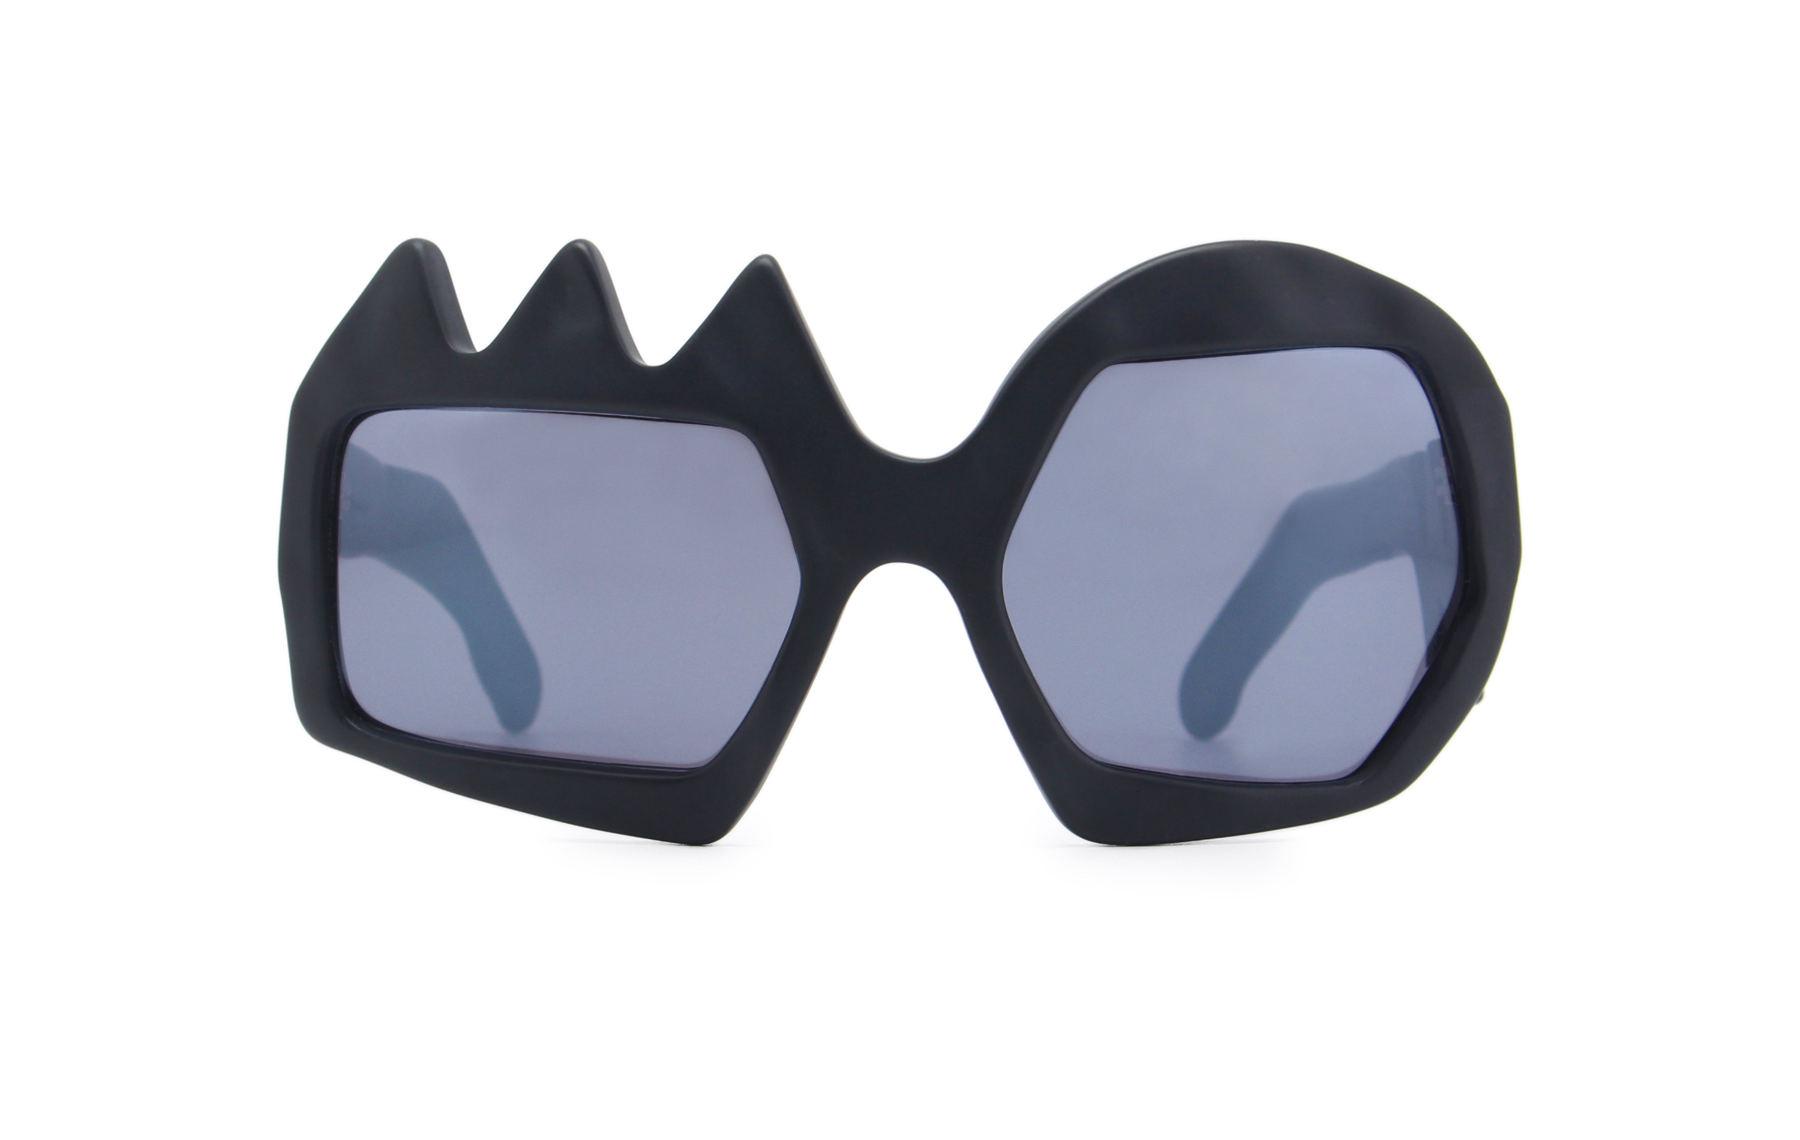 FAKBYFAK x Walter Van Beirendonck  Lightning Sunglasses. Black Code: 09/11/01